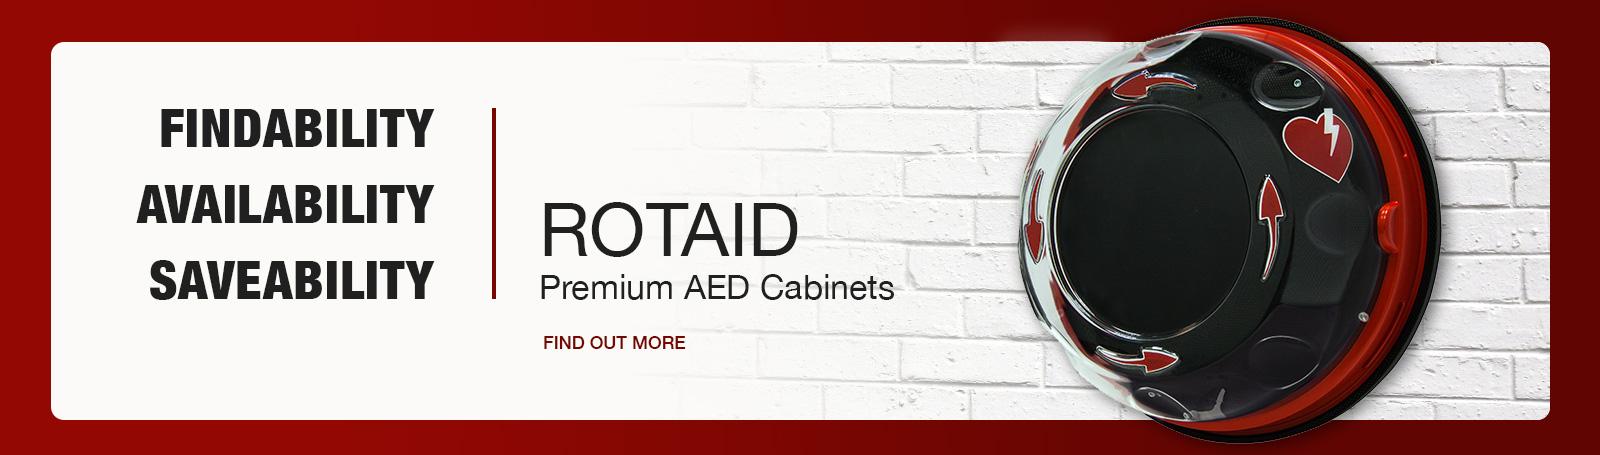 rotiad